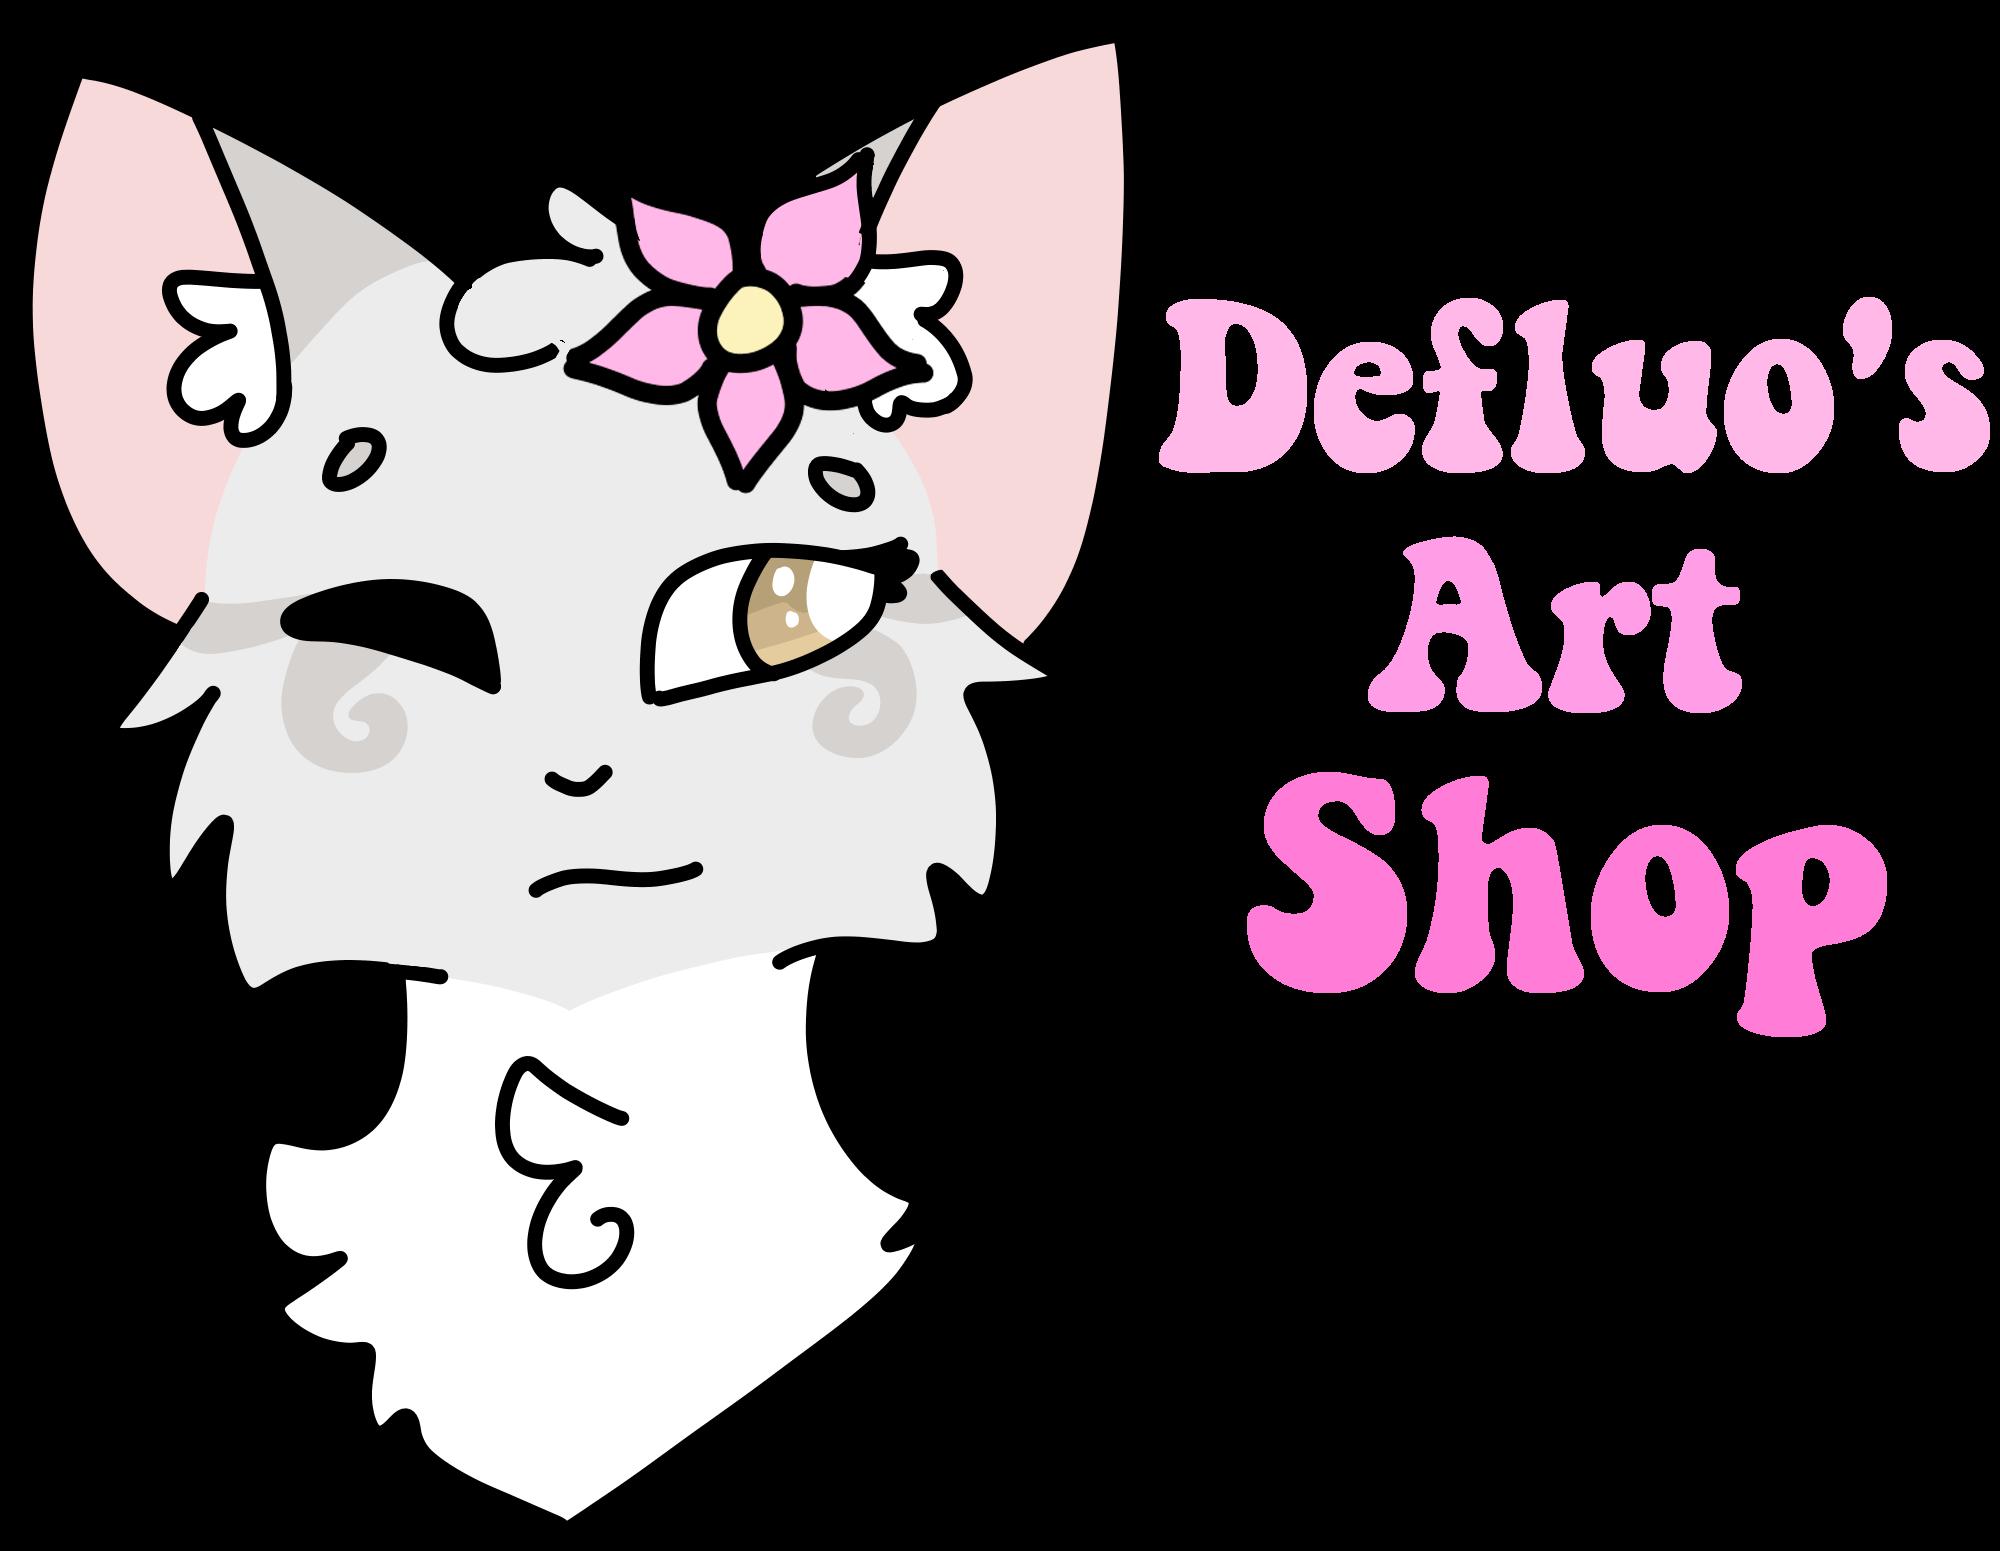 Defluo/defluo's art shop